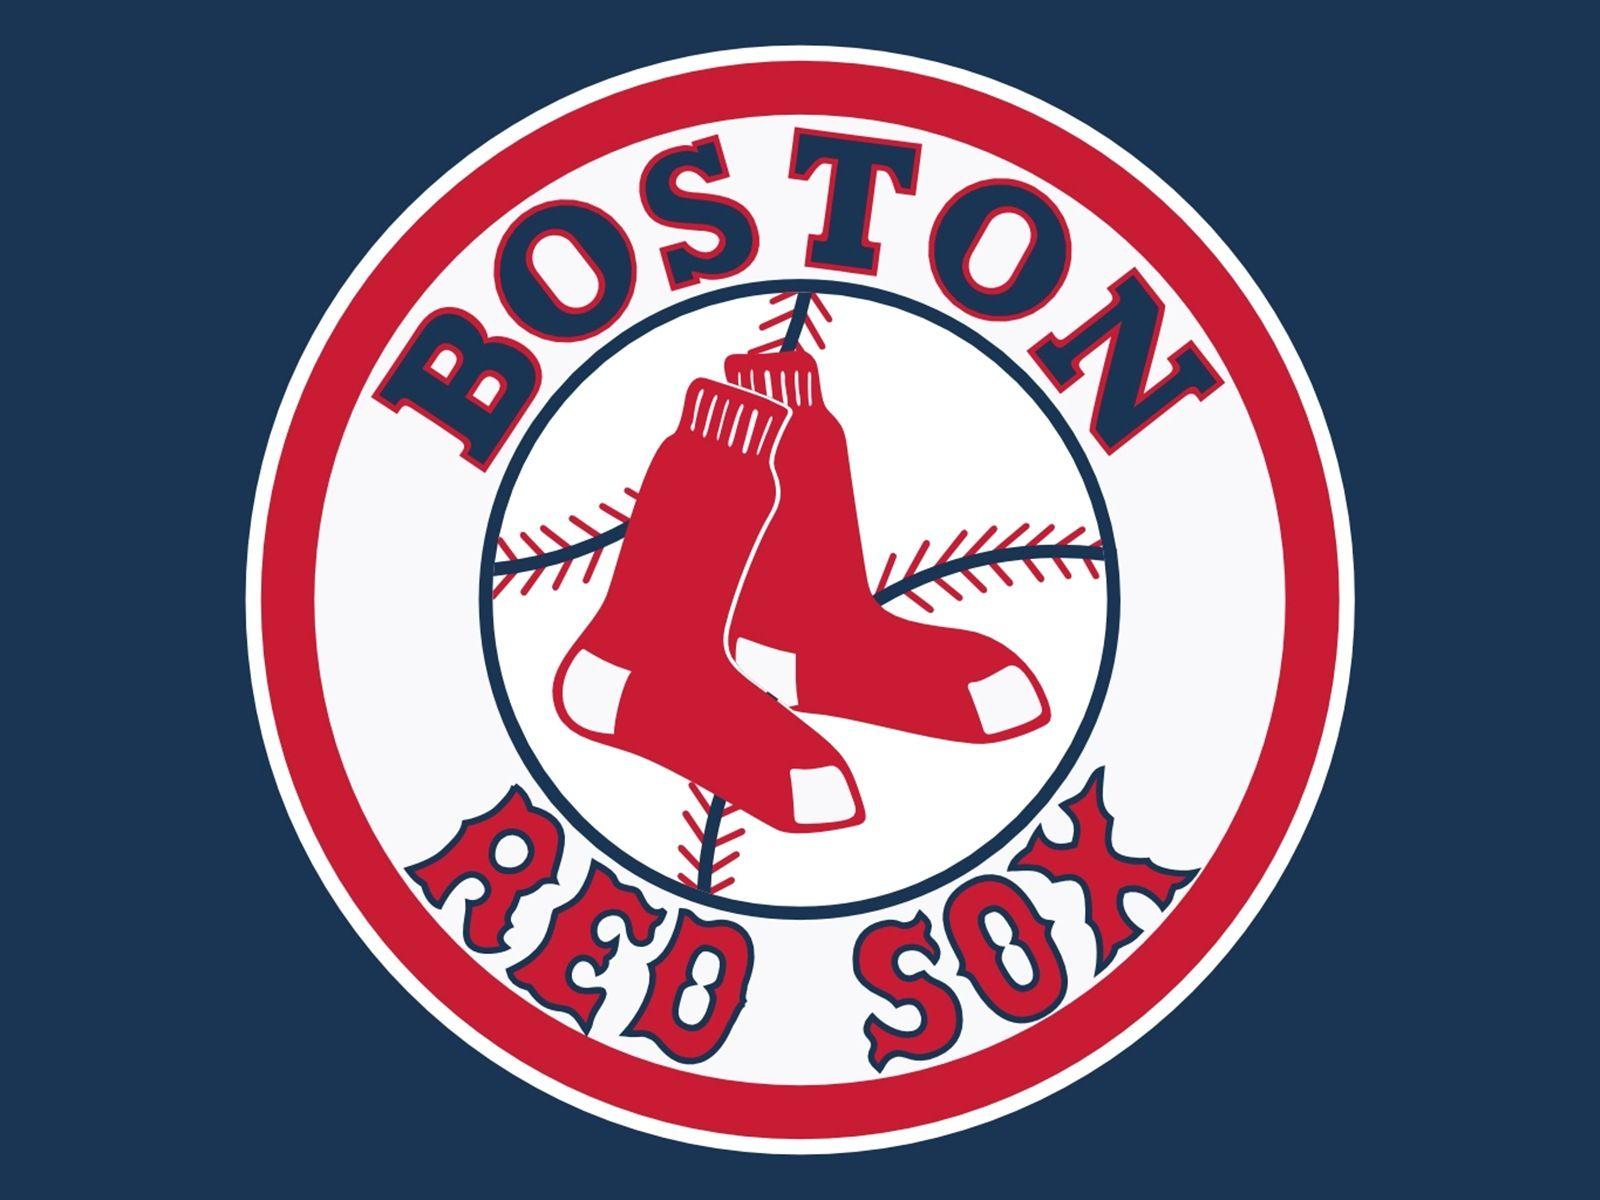 Boston Red Sox Logo Wallpaper Free Download Clip Art Free Clip.